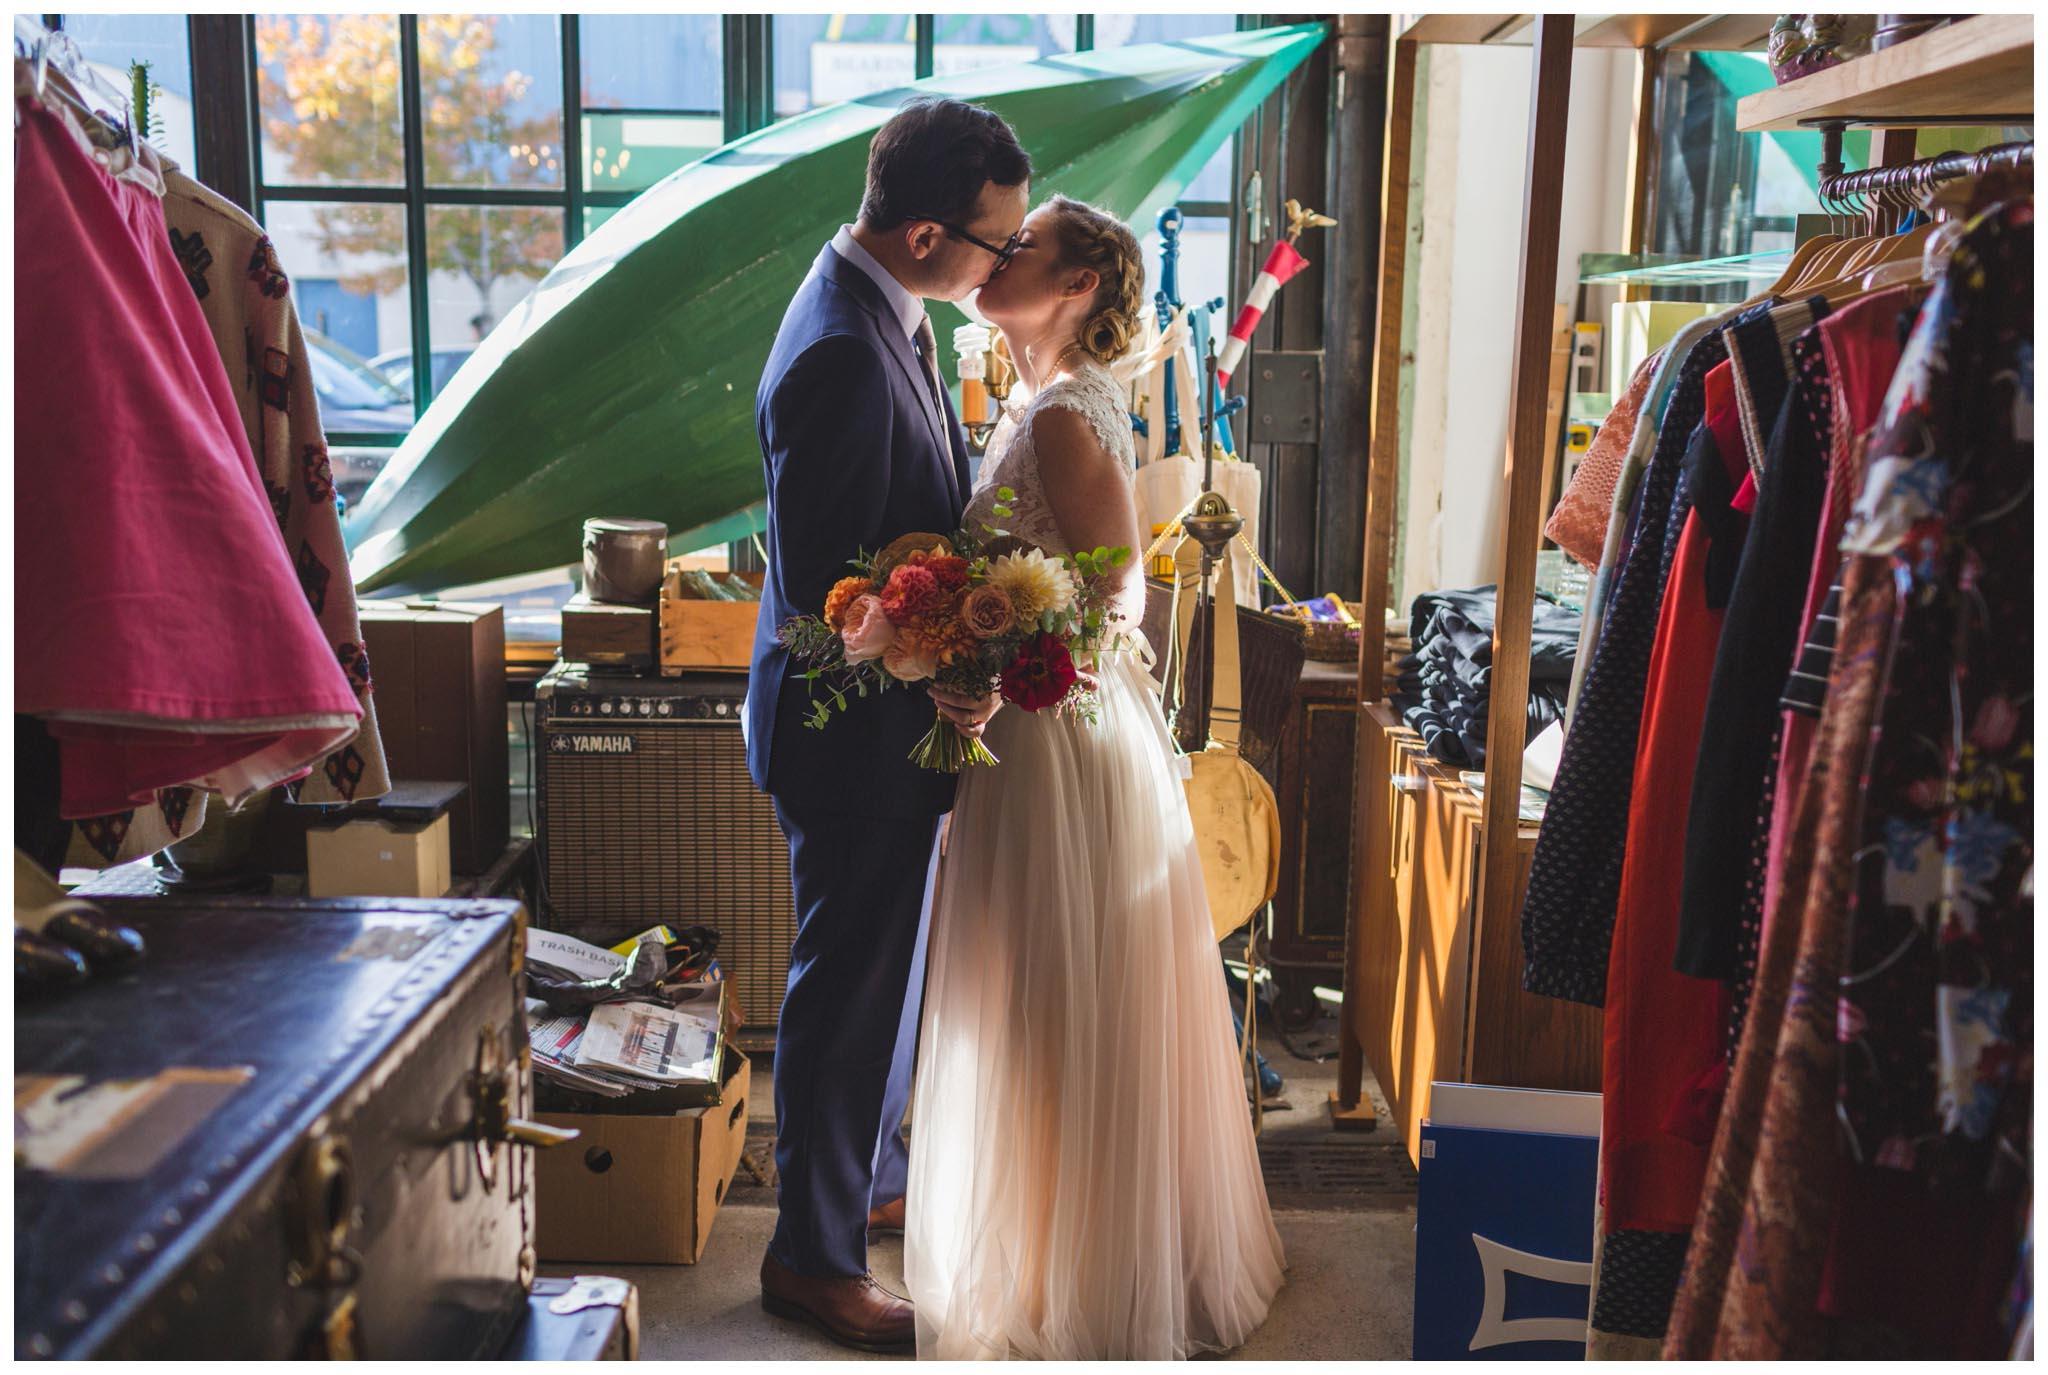 Jinxed, Kensington, wedding